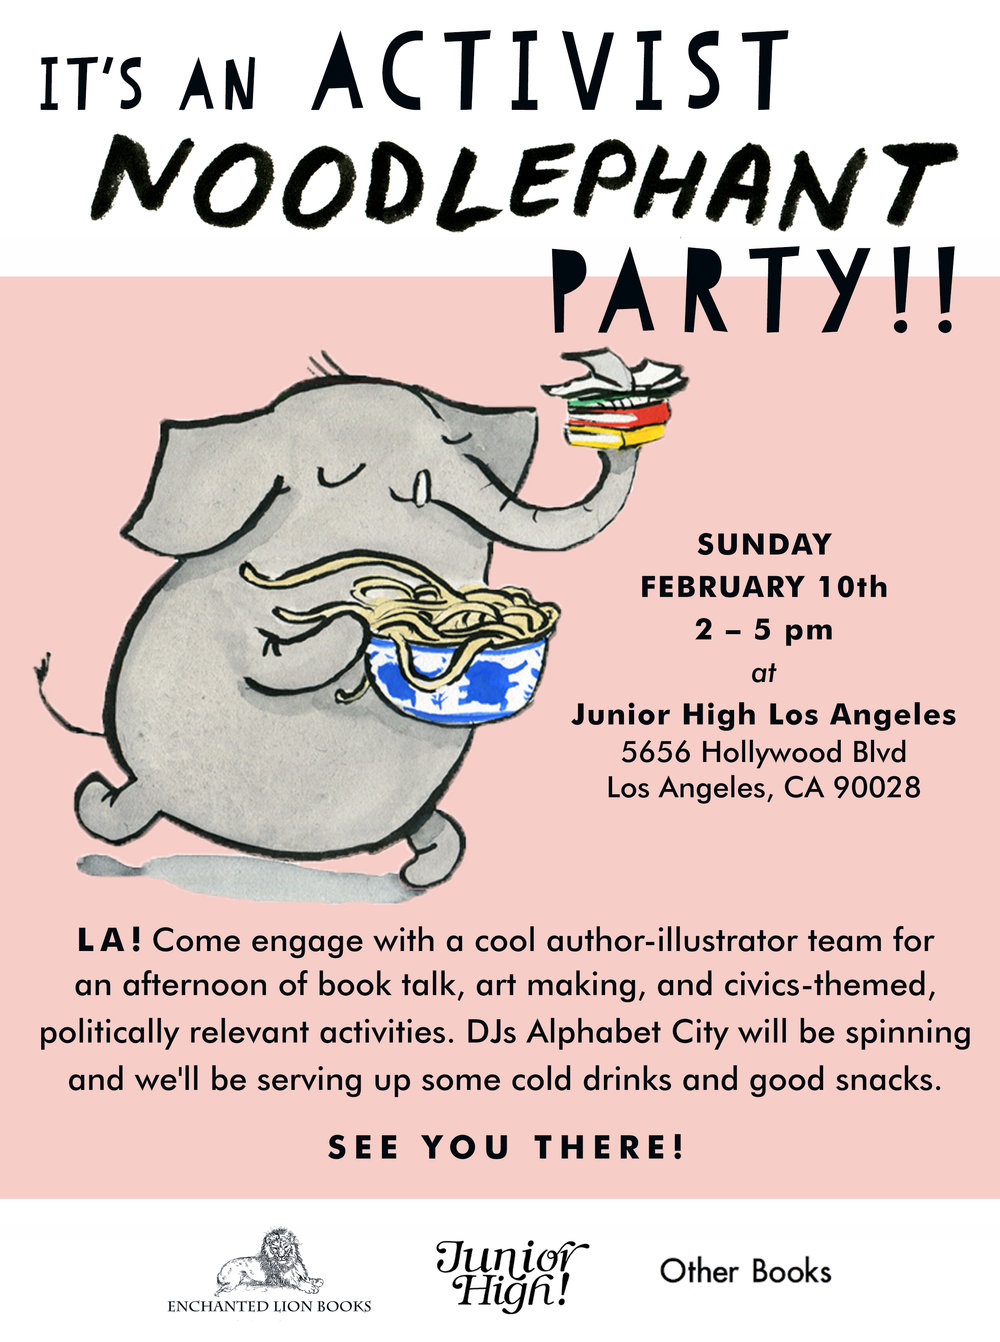 noodlephant party poster final.jpg